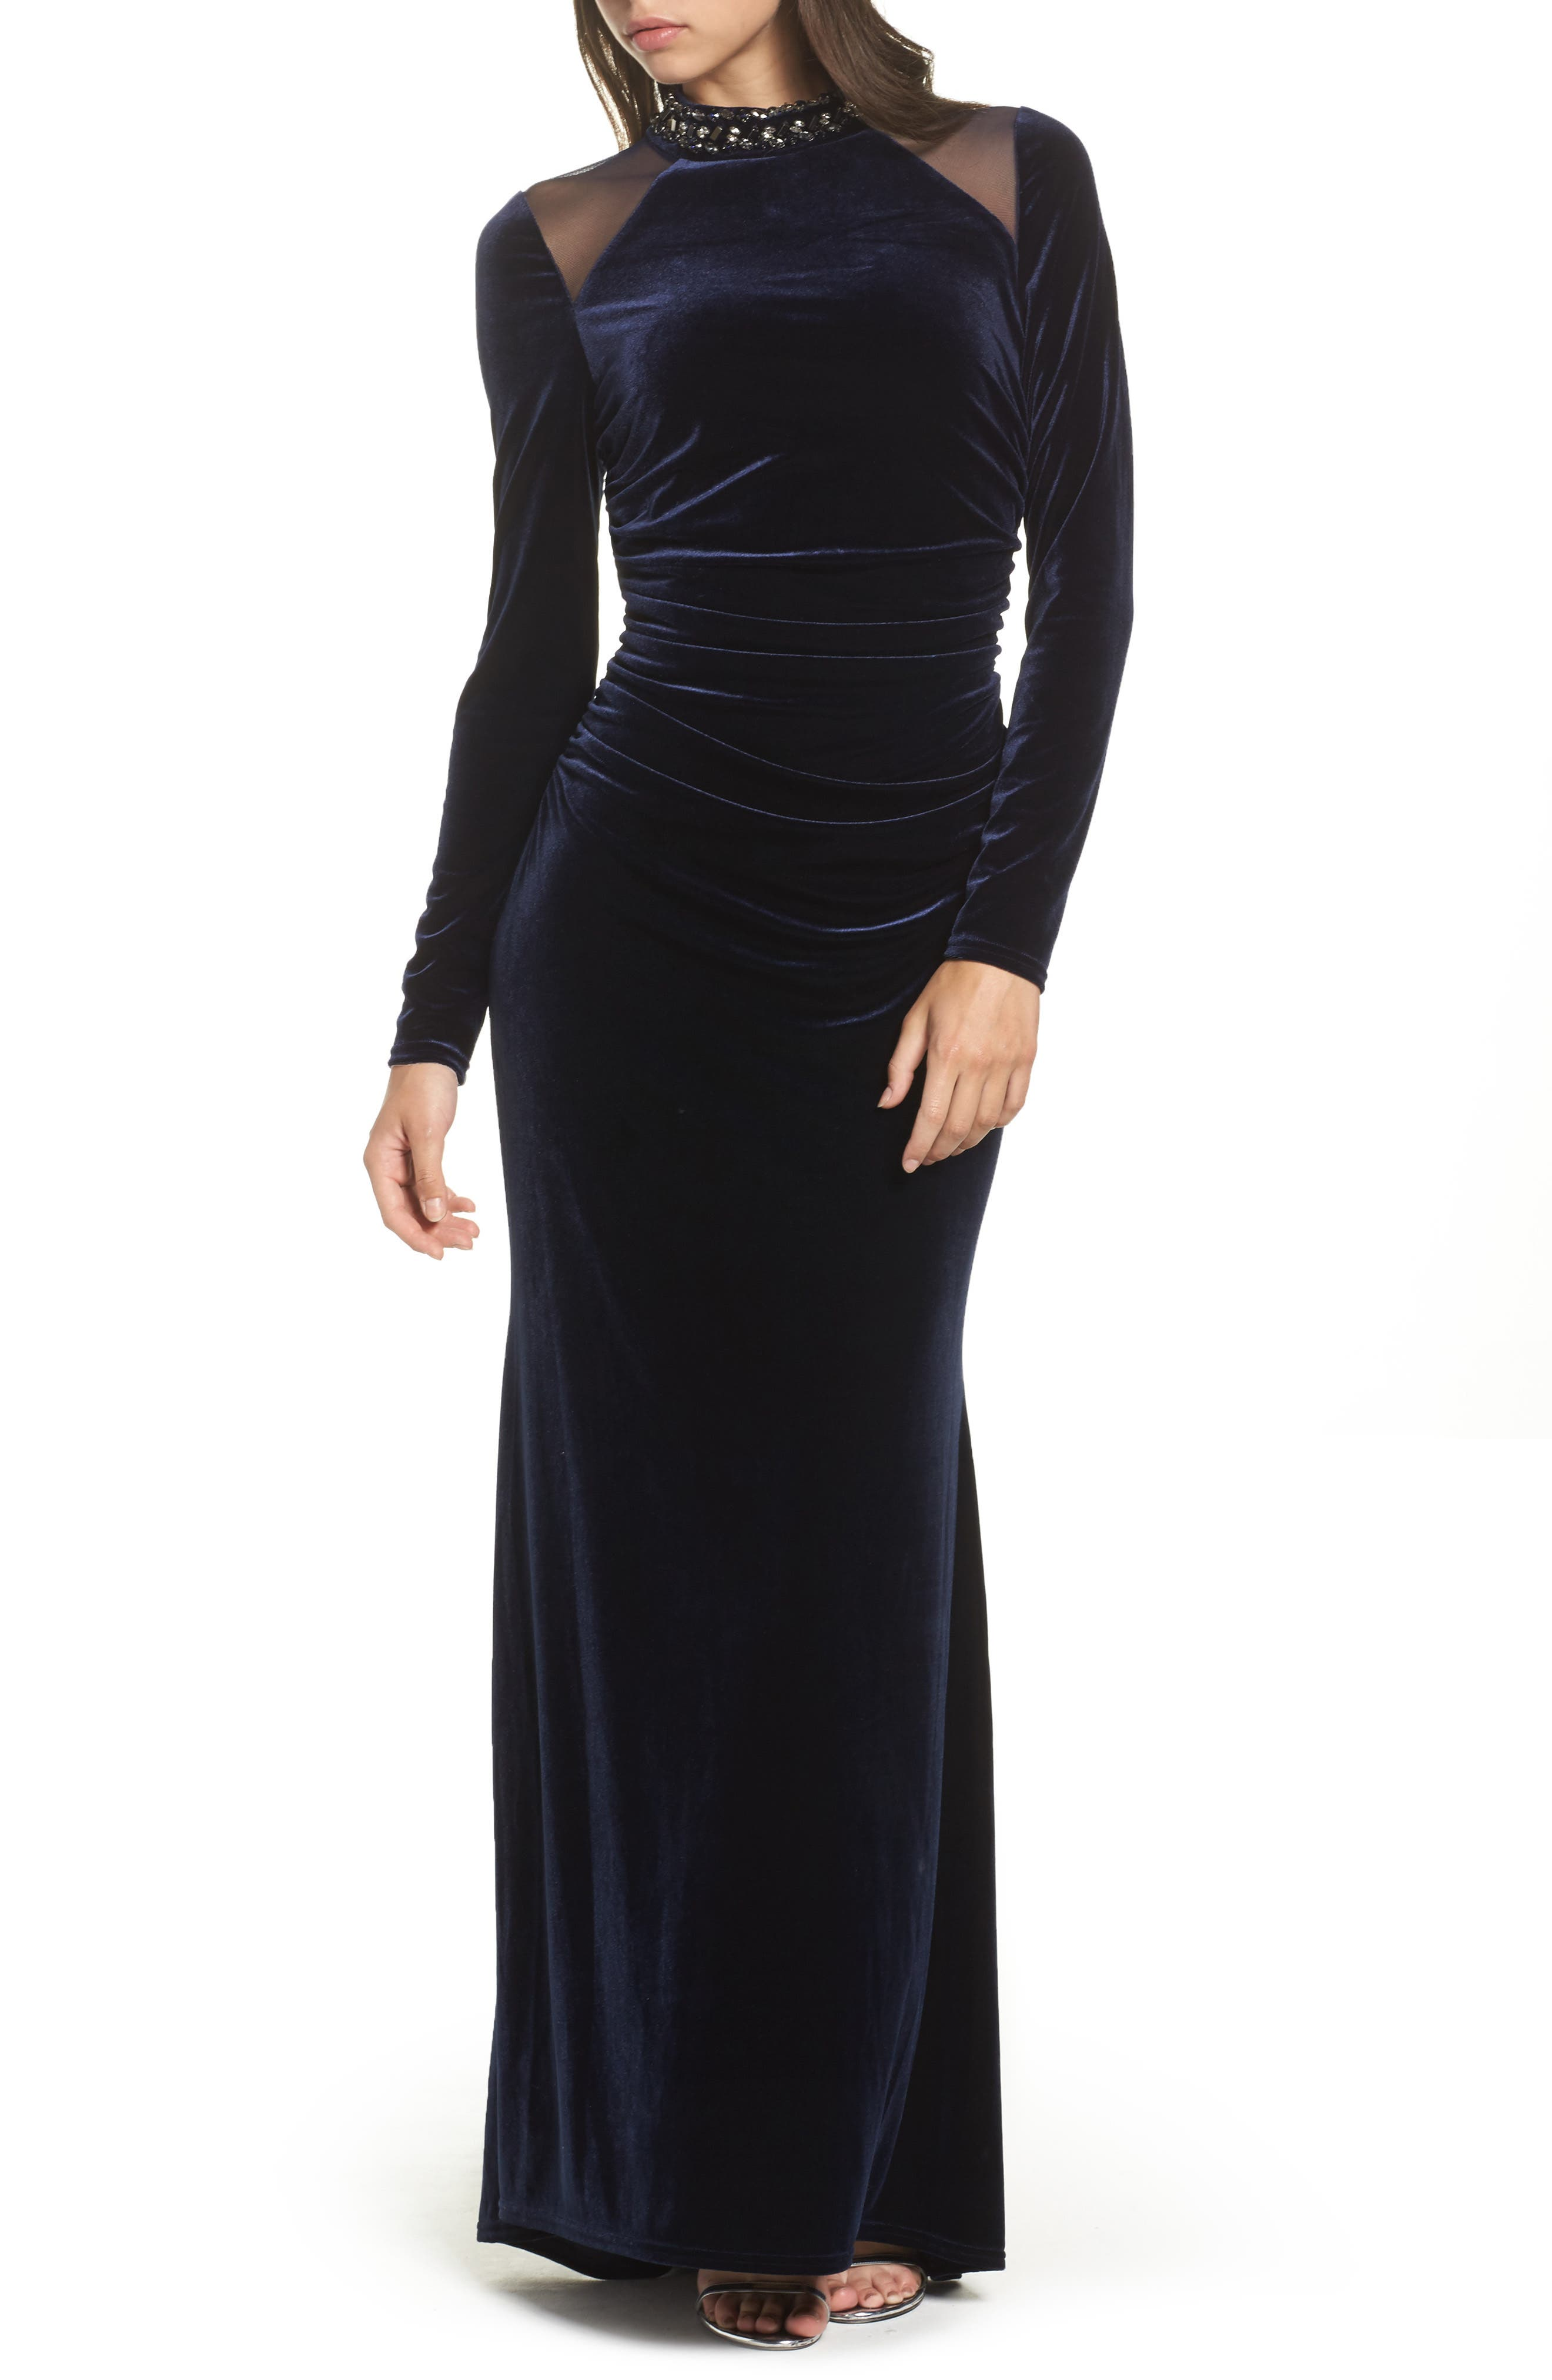 Main Image - Vince Camuto Mesh Panel Embellished Velvet Gown